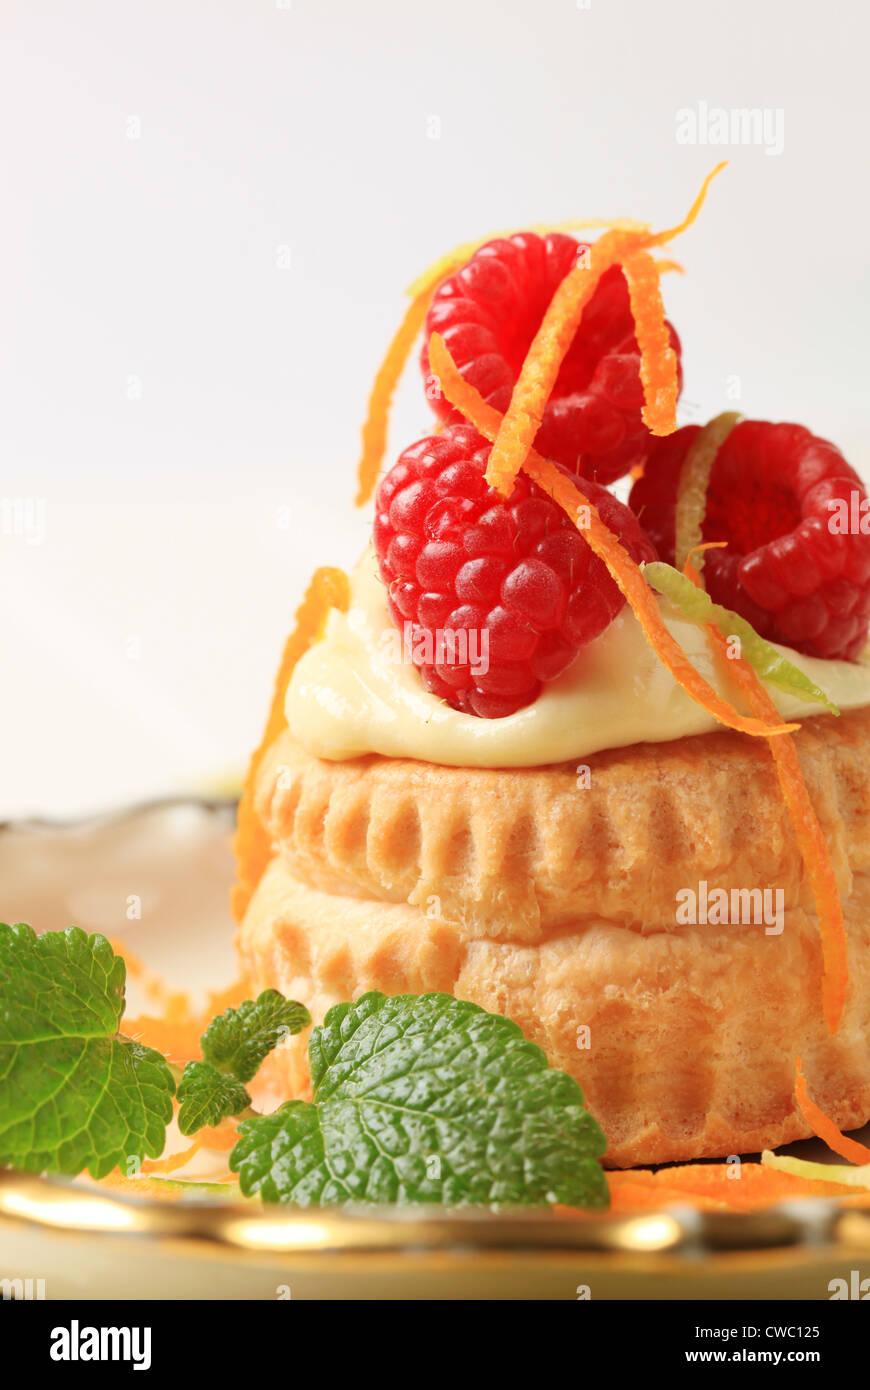 Shell de hojaldre rellenos de crema cubierto con frambuesas. Imagen De Stock